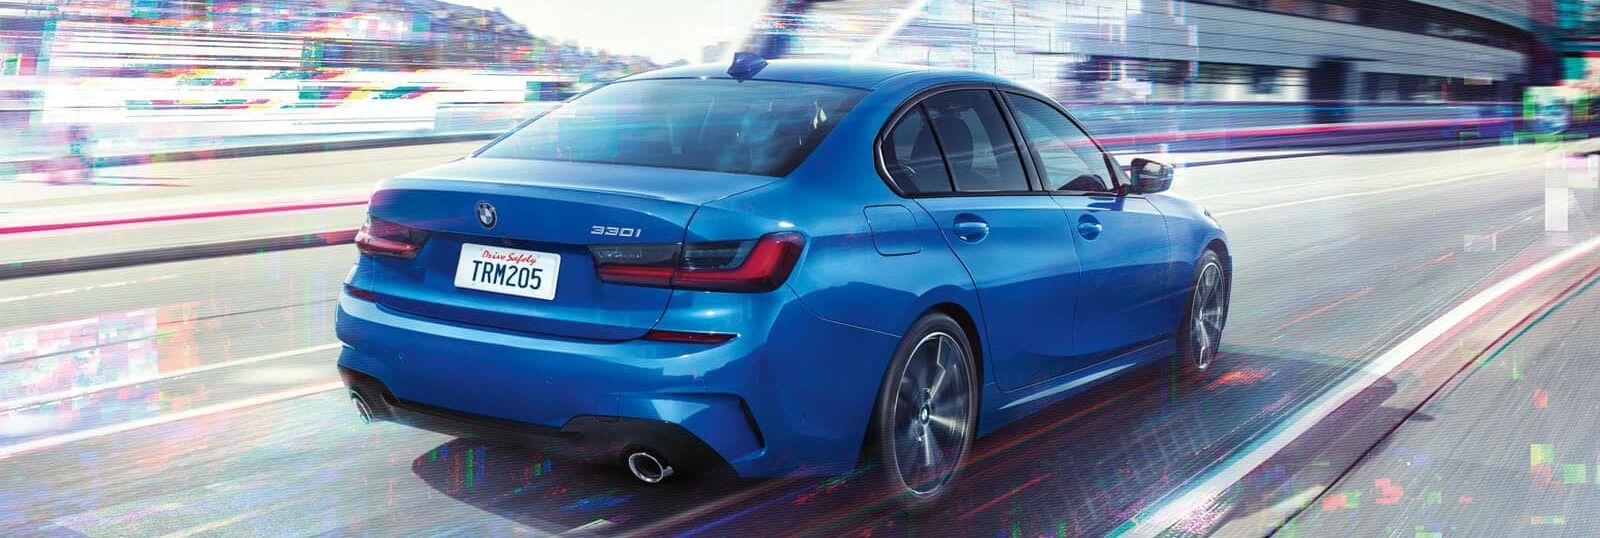 2019 BMW 3 Series Leasing near Valparaiso, IN